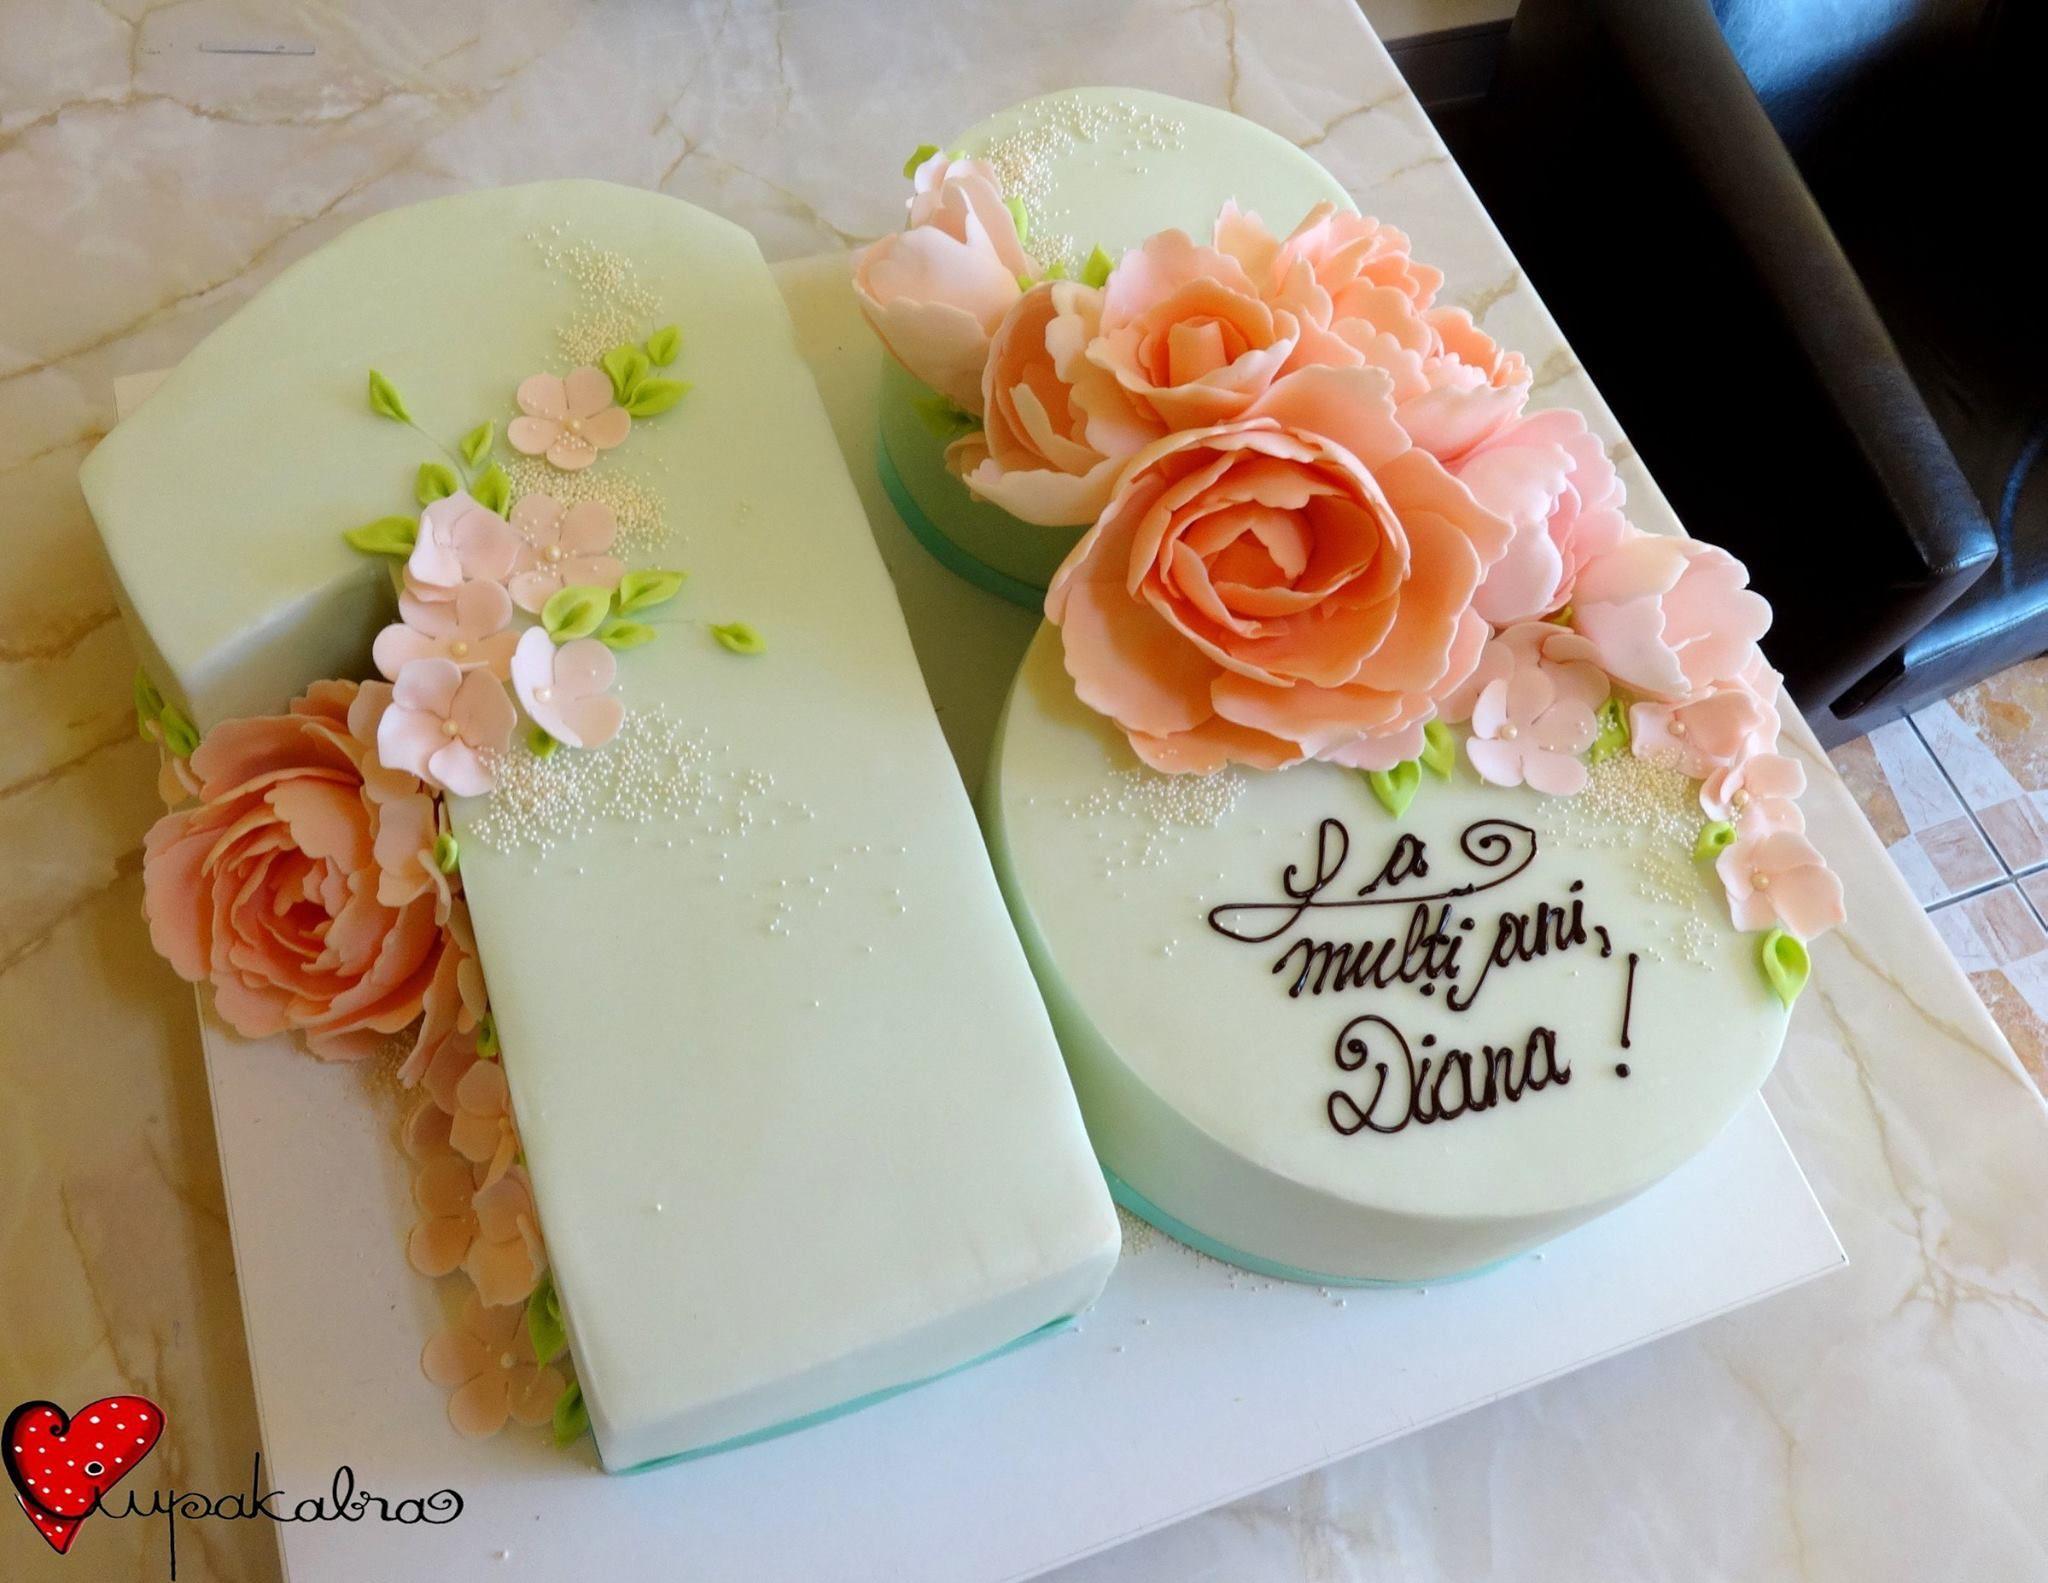 https://www.facebook.com/Ciupakabra.cakes/photos/a.151635968198932.26296.138658532830009/906338359395352/?type=3